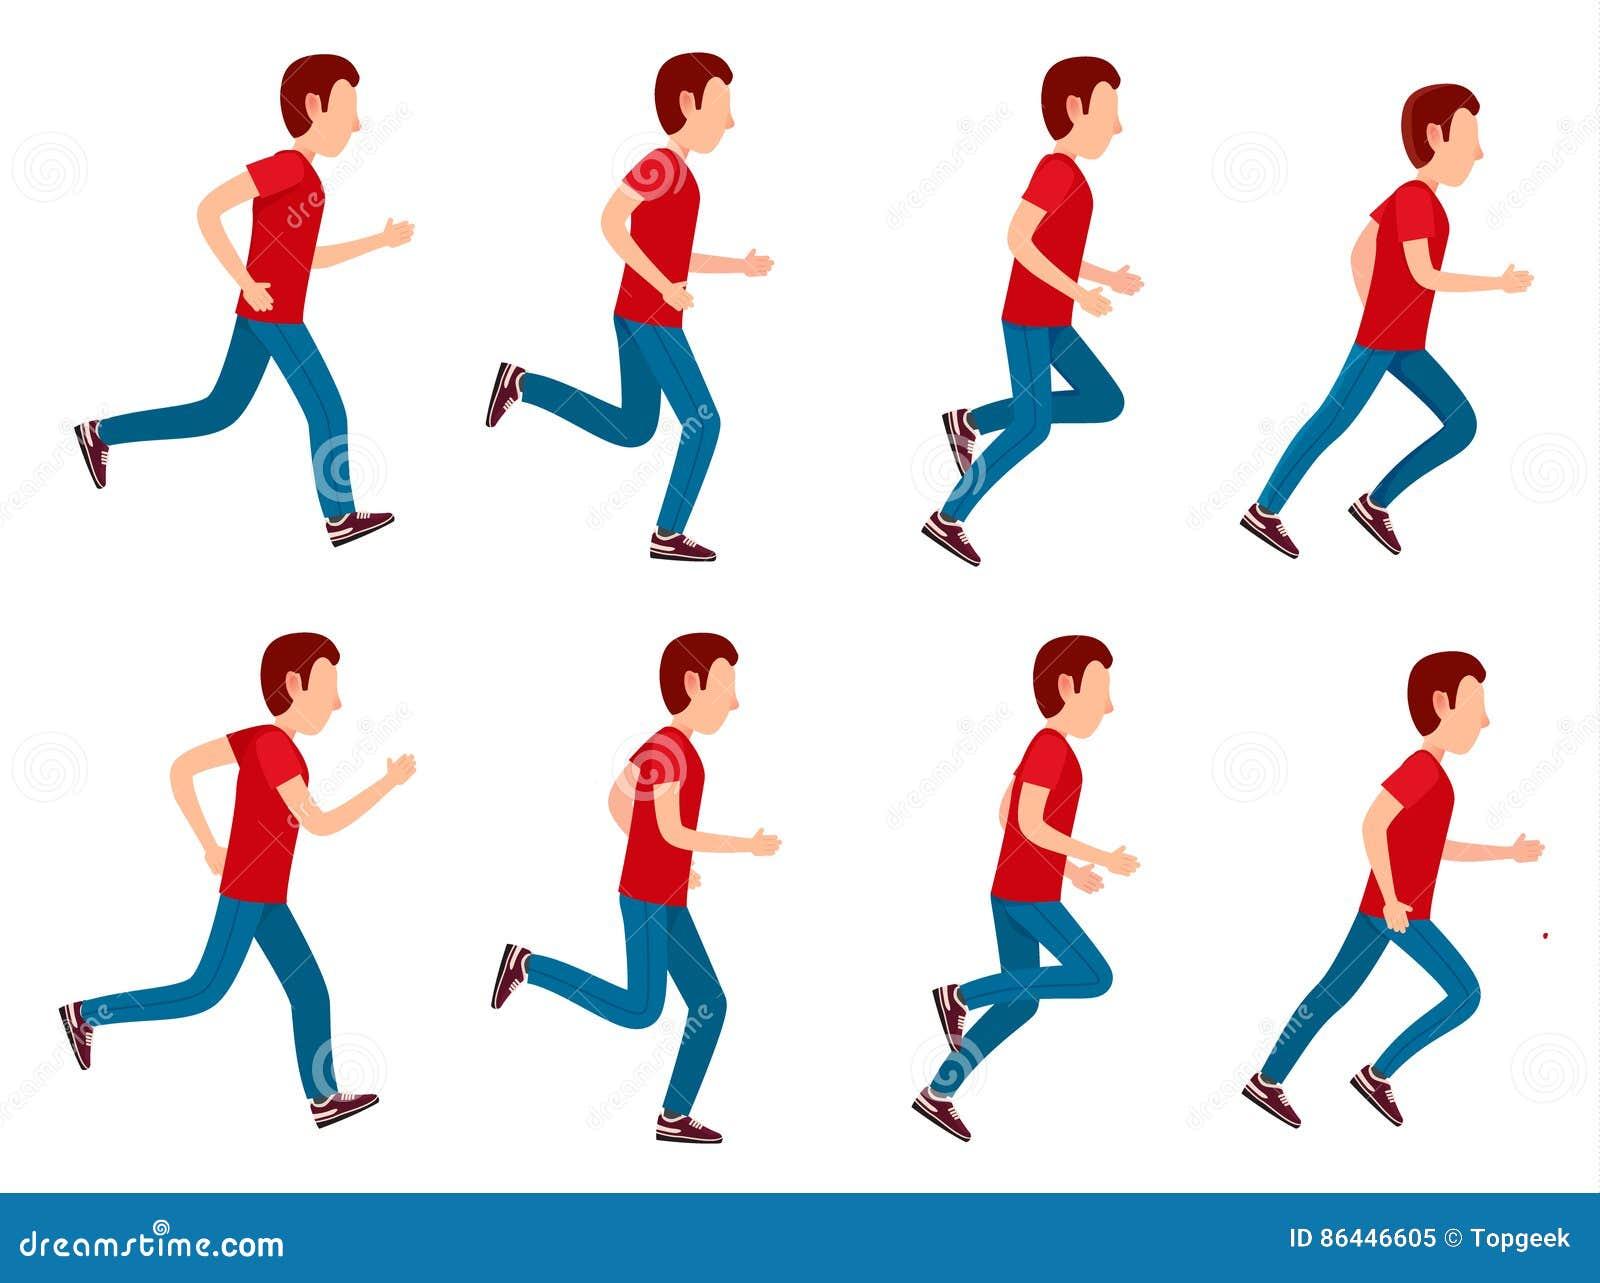 Running Man Animation Sprite Set. 8 Frame Loop. Stock Vector ...